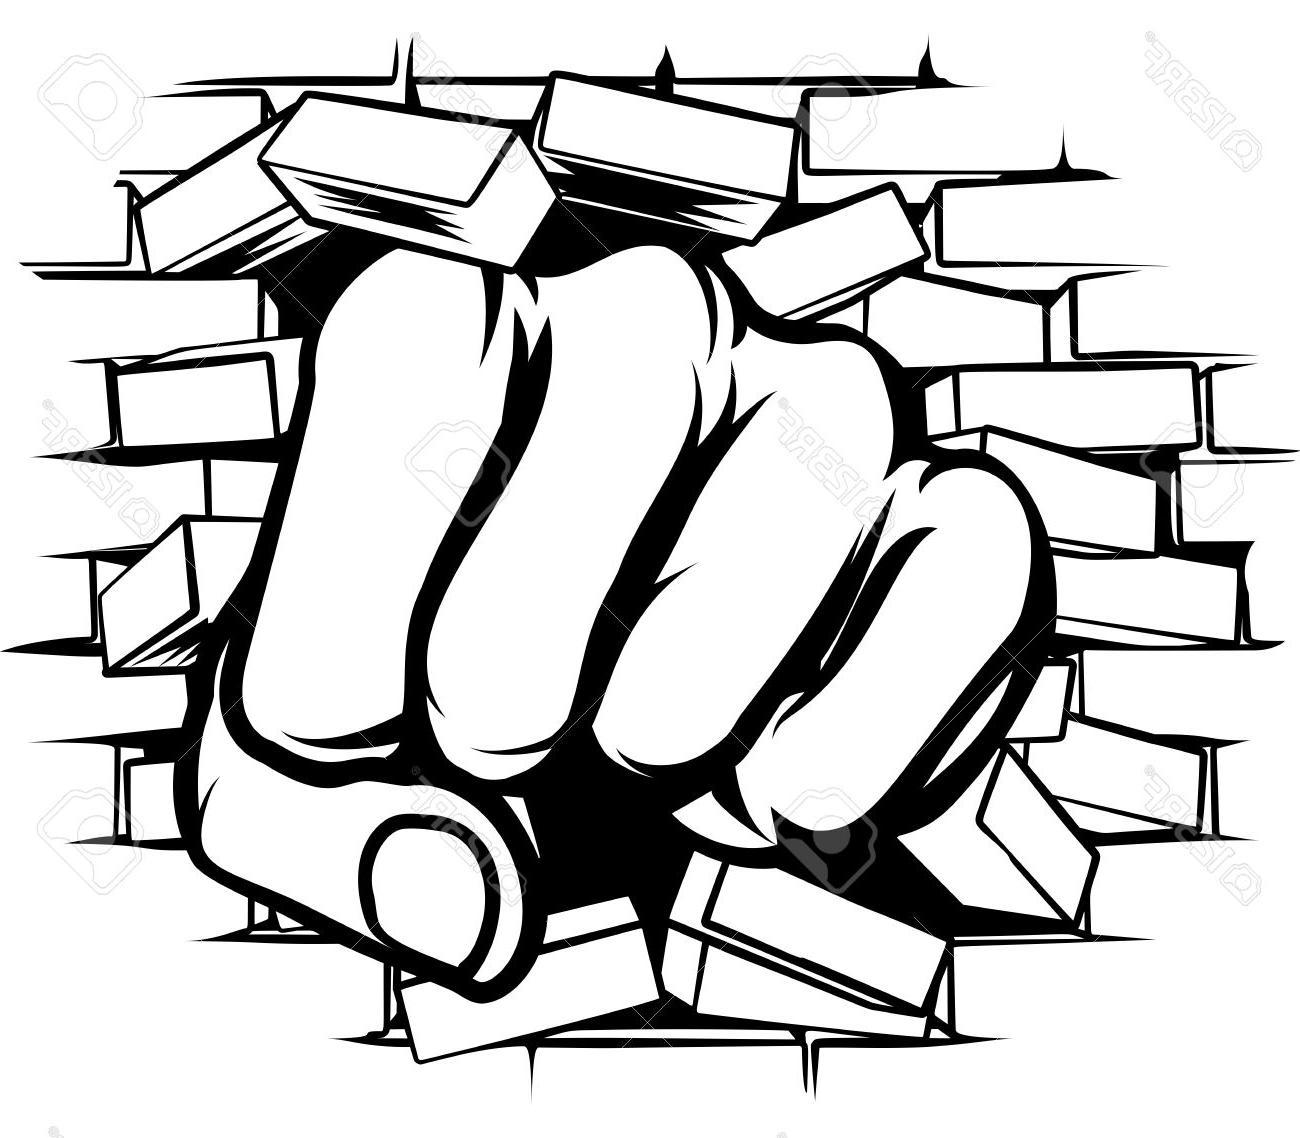 1300x1138 Unique Pop Art Cartoon Fist Hand Punching Through Brick Wall Stock